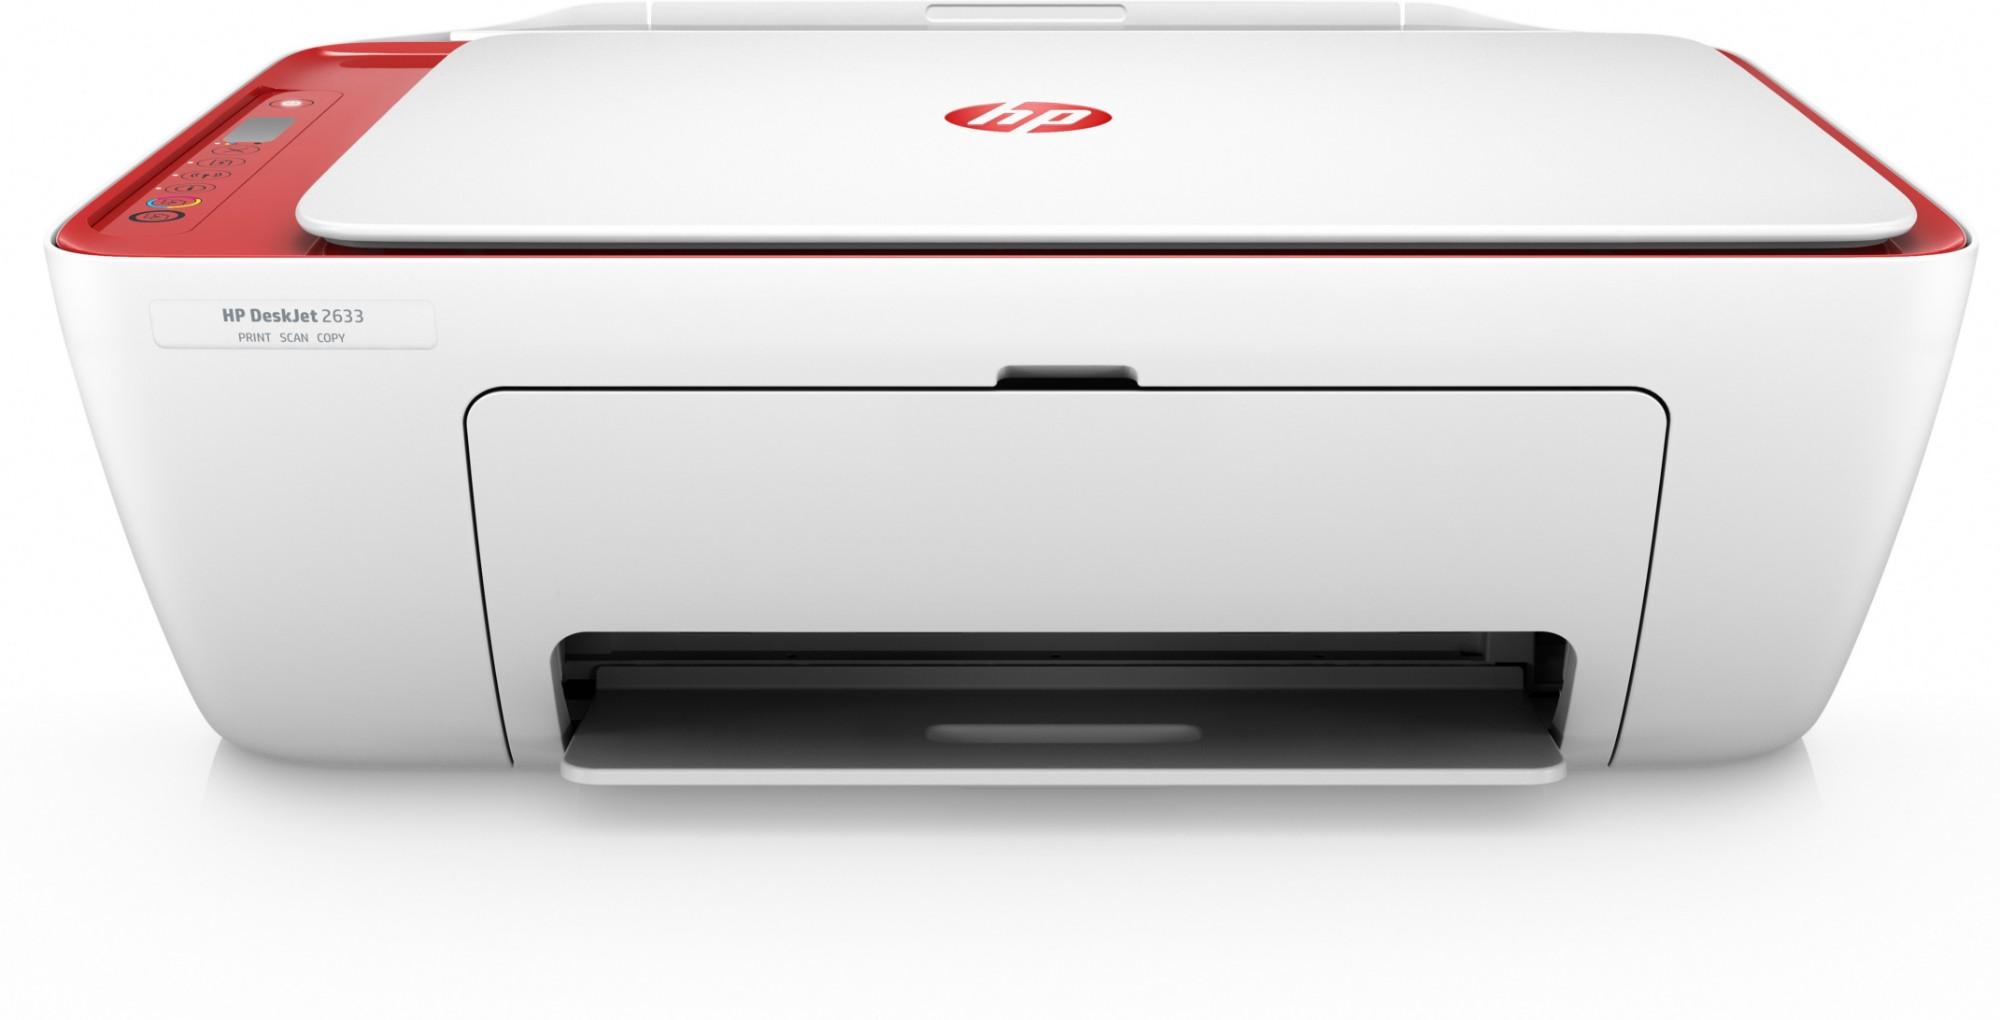 HP DeskJet 2633 AiO 4800 x 1200DPI Thermal Inkjet A4 7.5ppm Wi-Fi